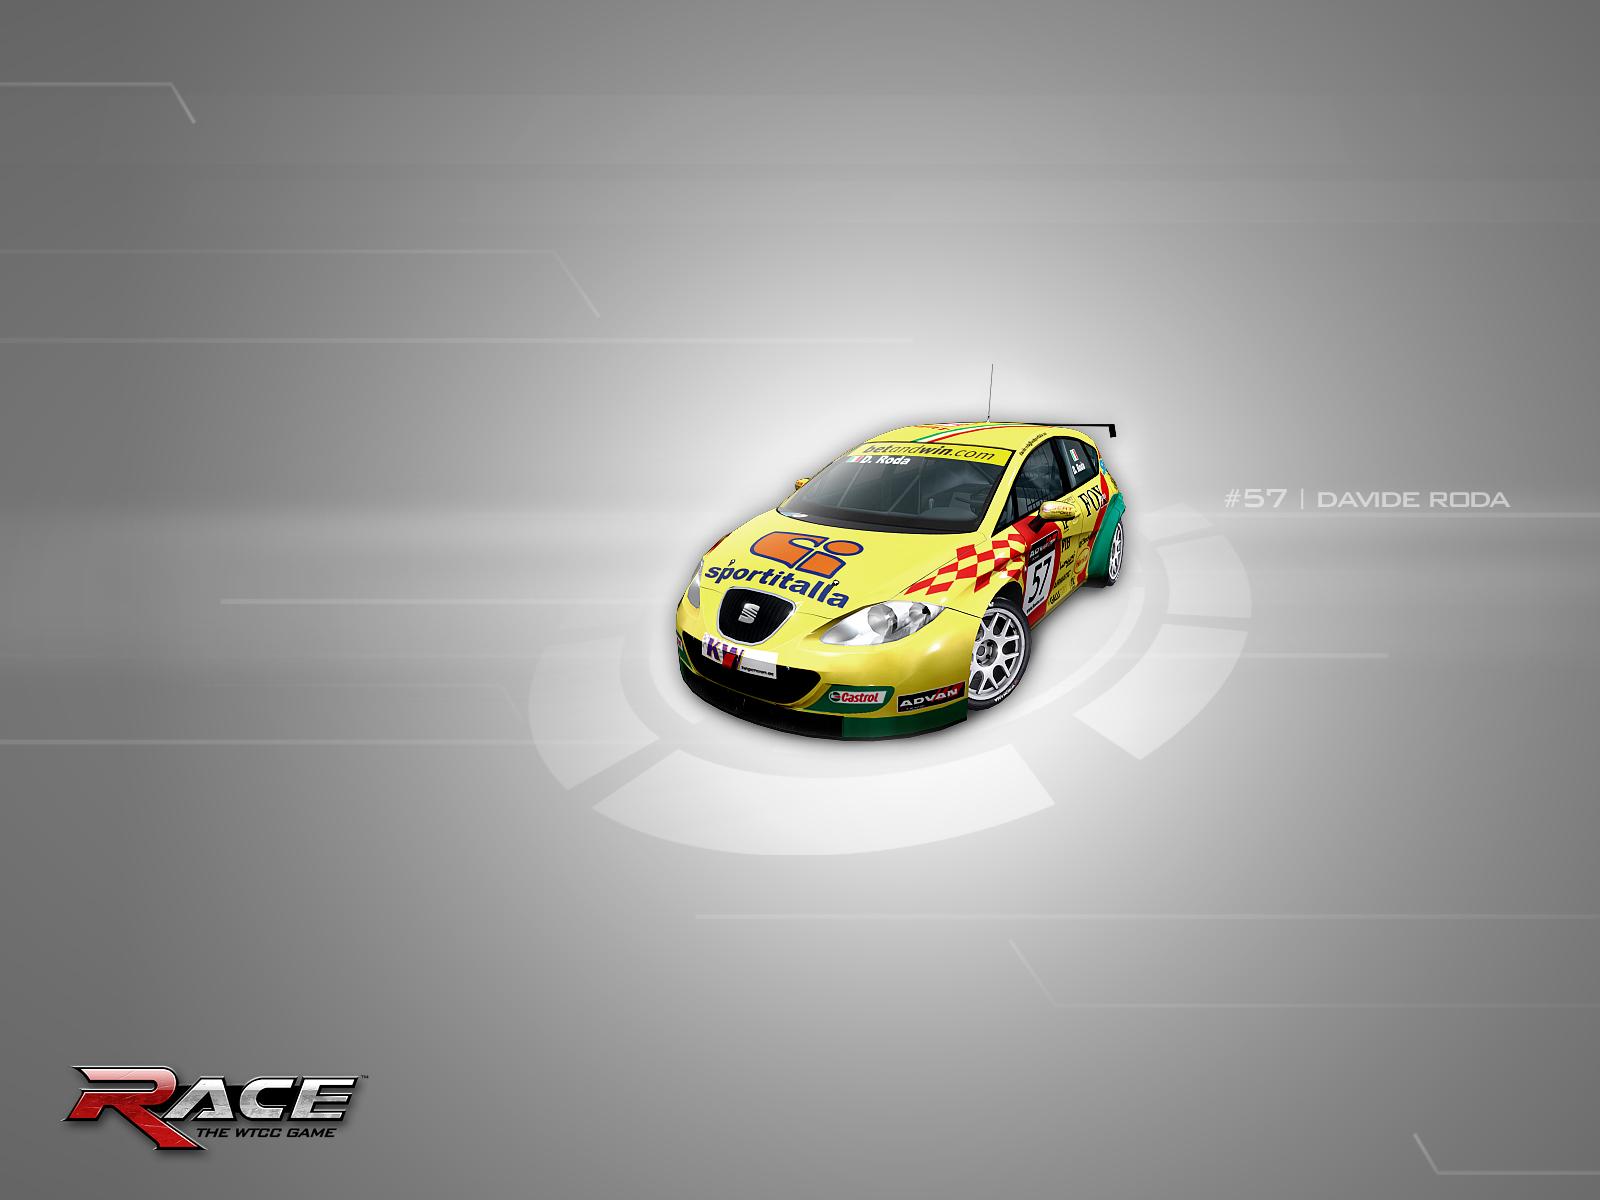 Race the wtcc - обои на рабочий стол.